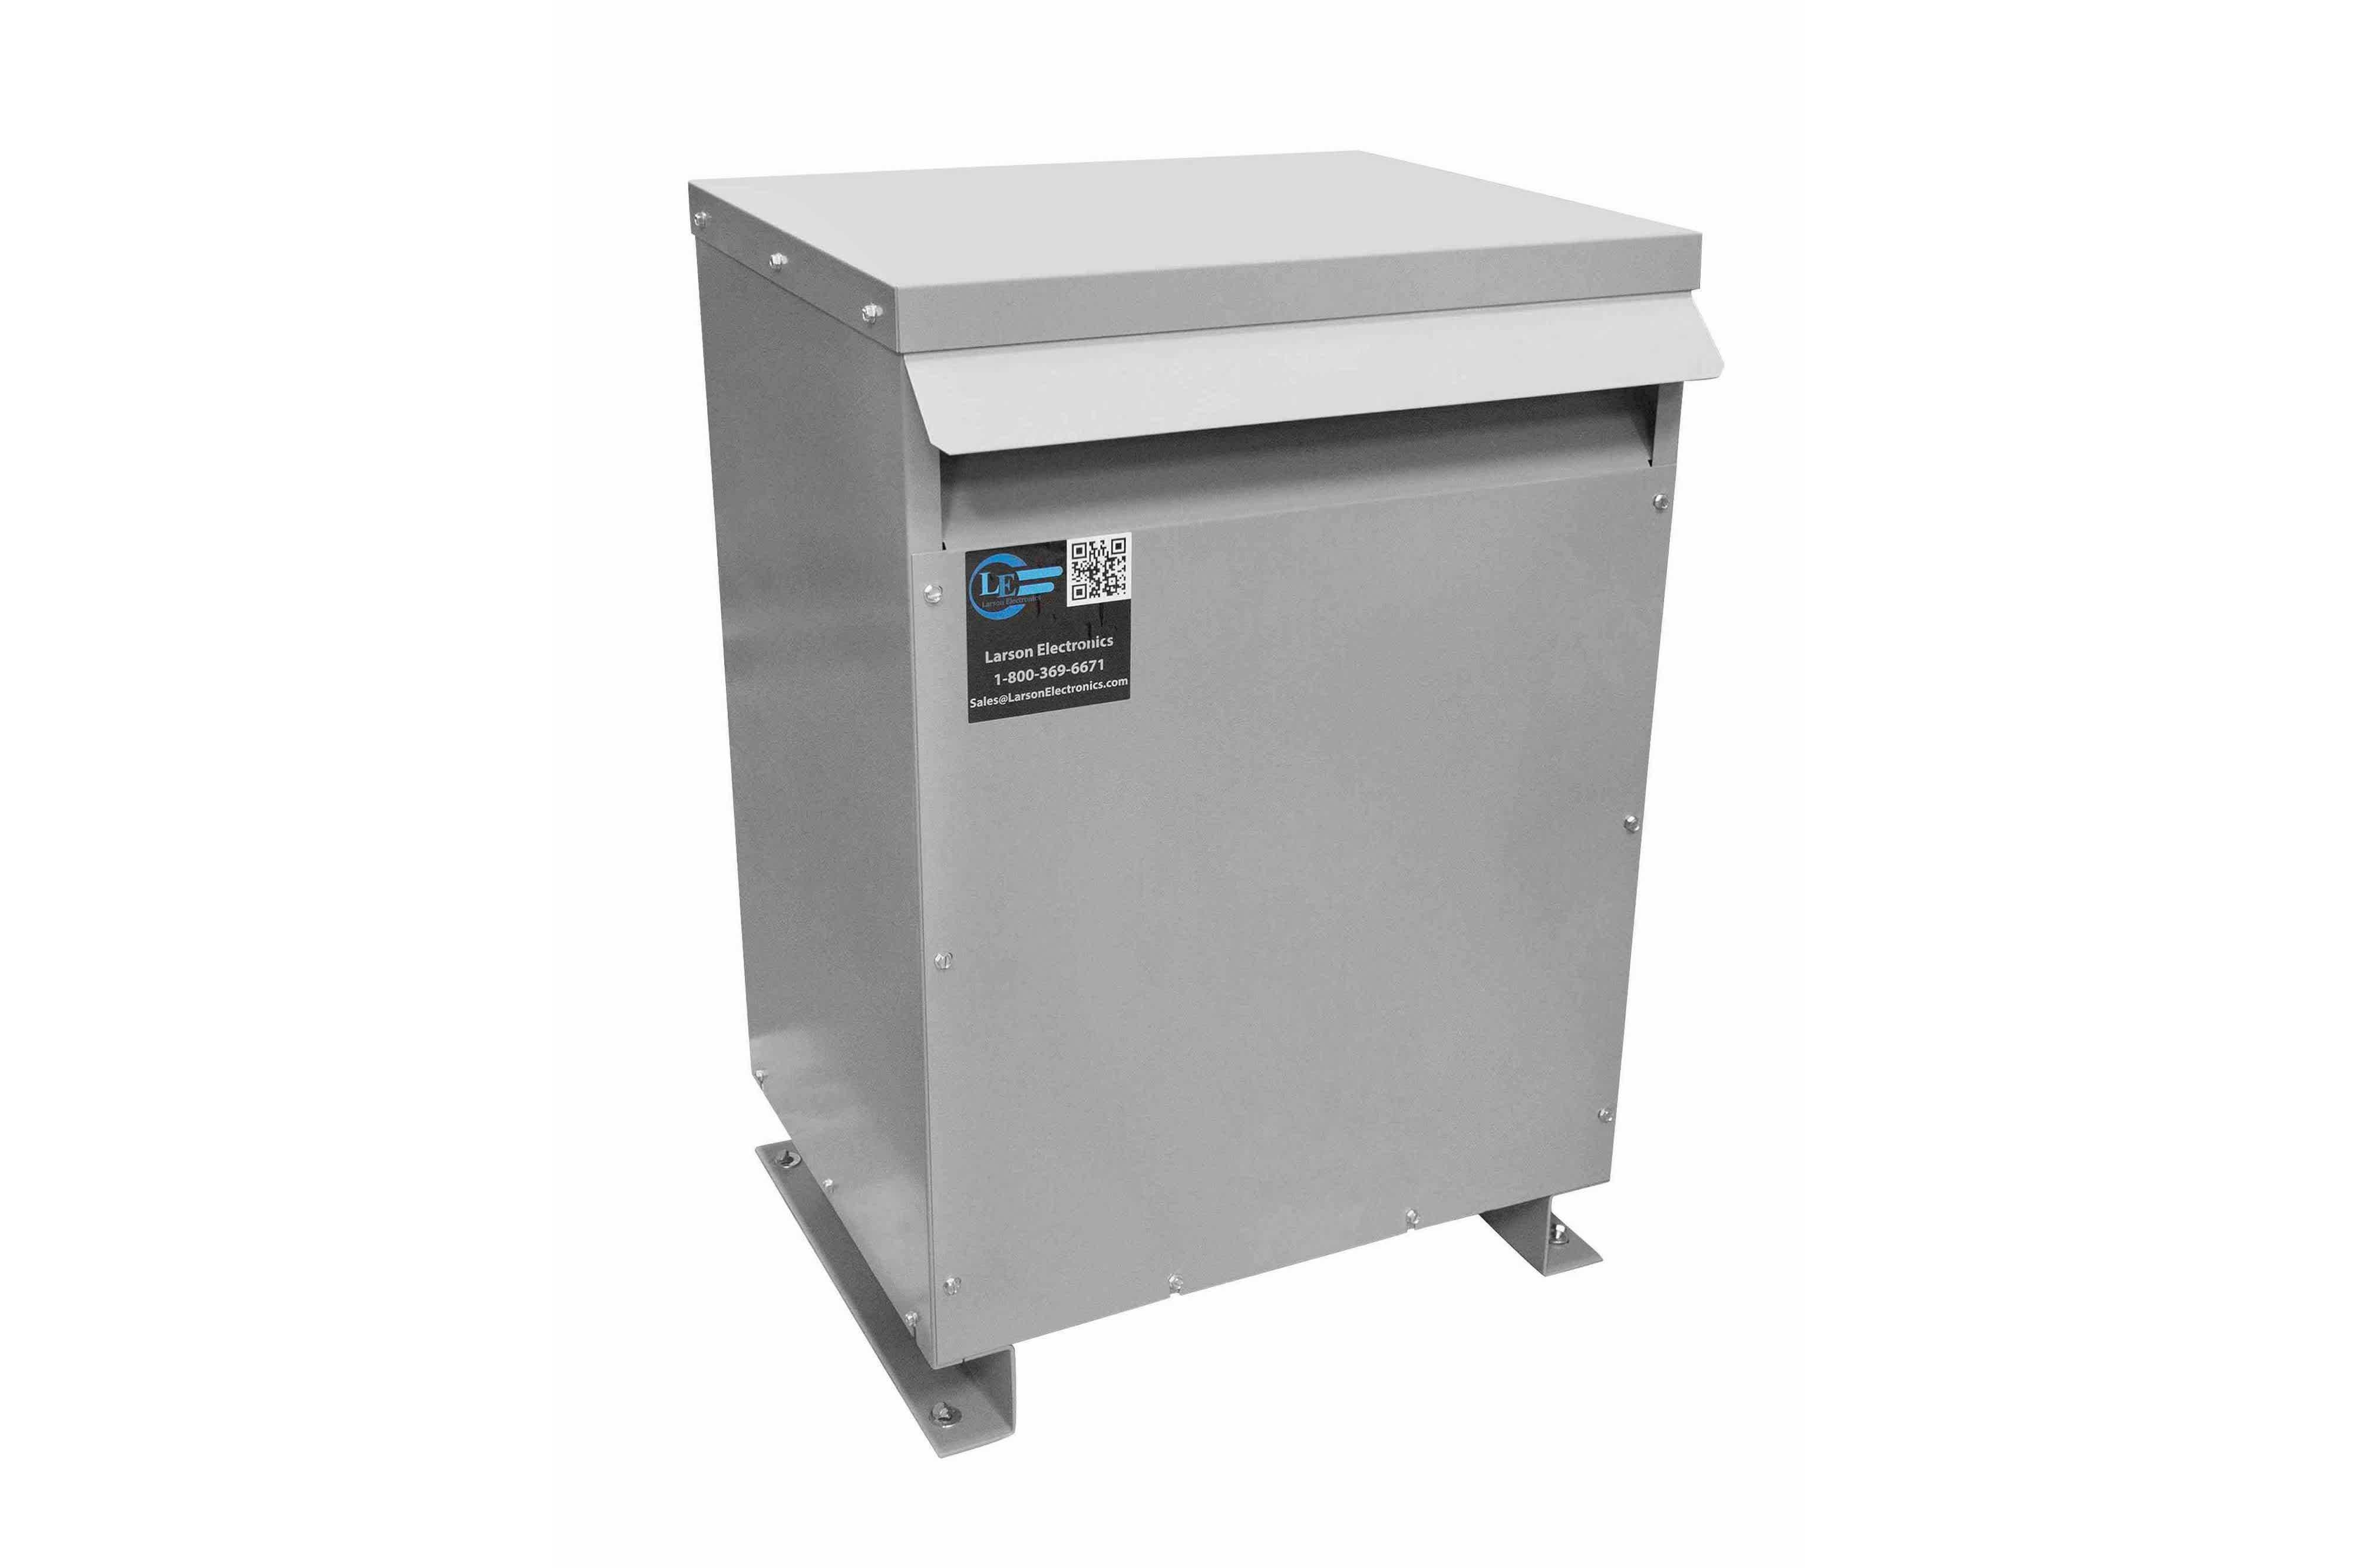 700 kVA 3PH Isolation Transformer, 415V Wye Primary, 480V Delta Secondary, N3R, Ventilated, 60 Hz